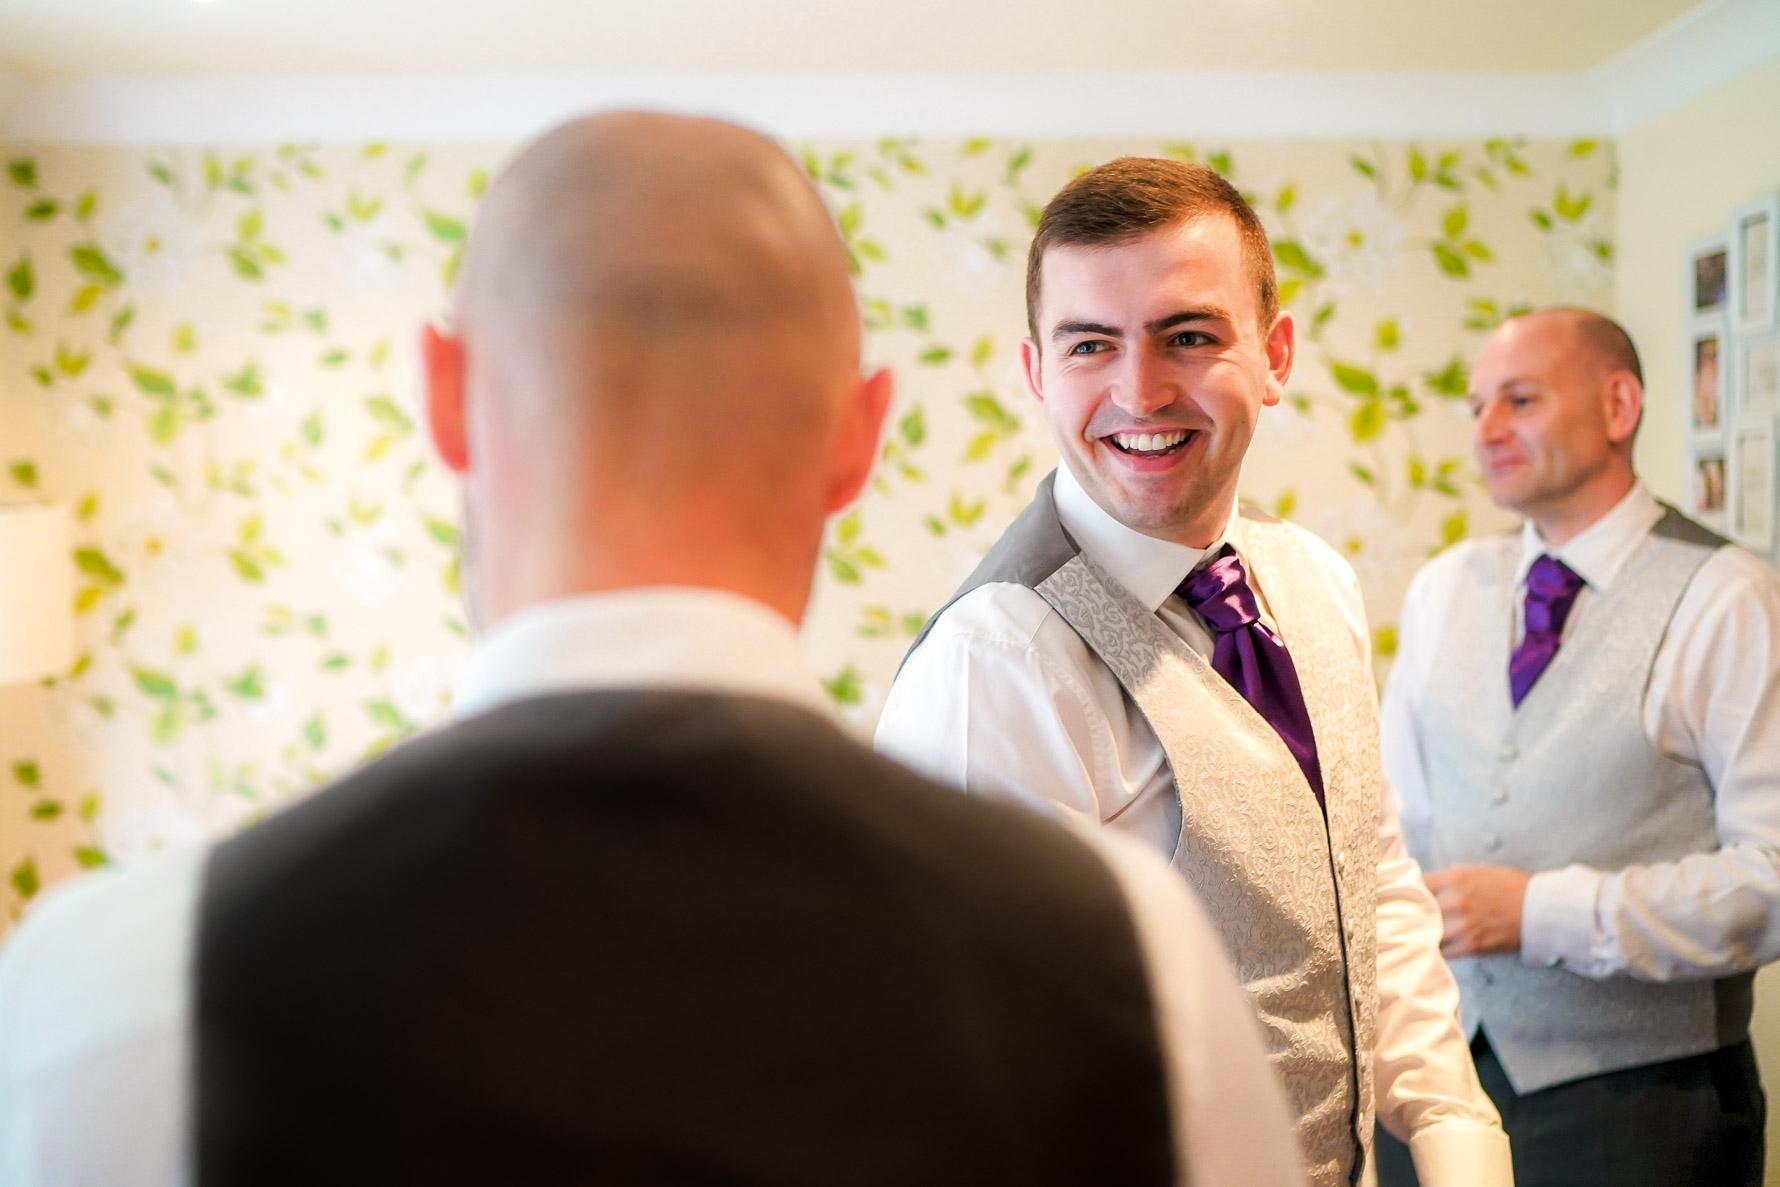 groom and grommsmen